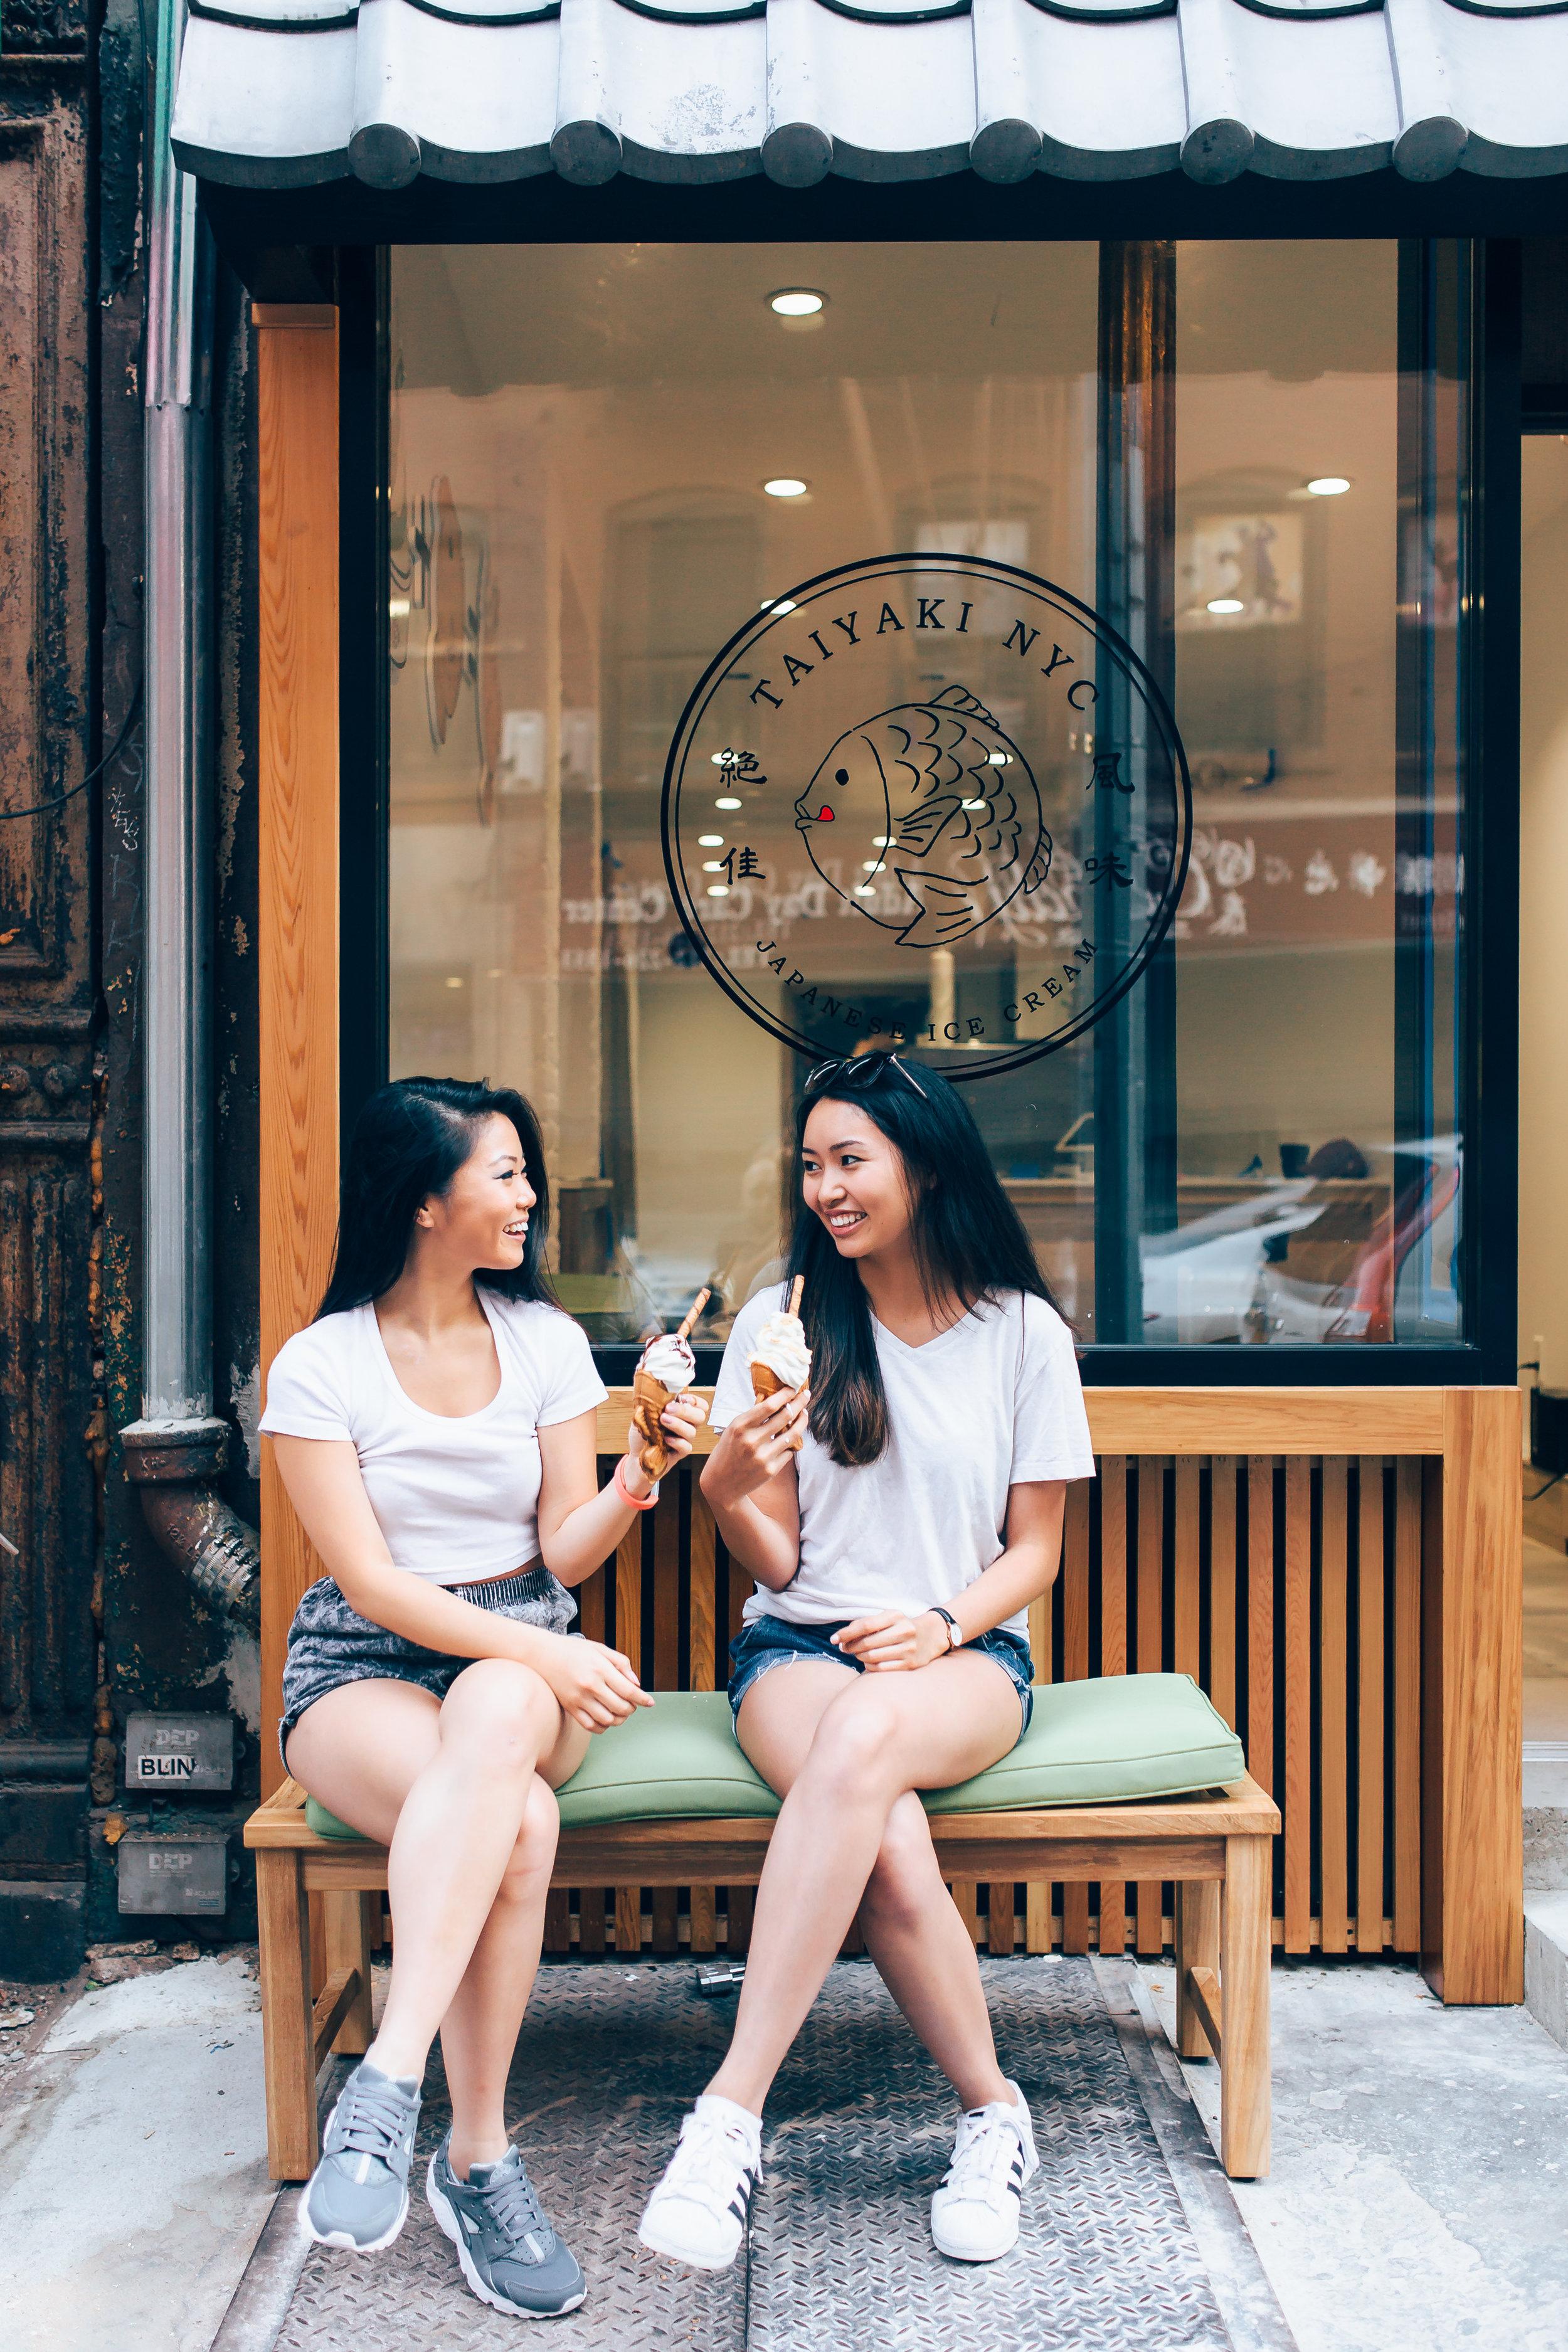 Elena (left) and Karen (right) enjoying some Taiyaki Ice Cream pre-opening.